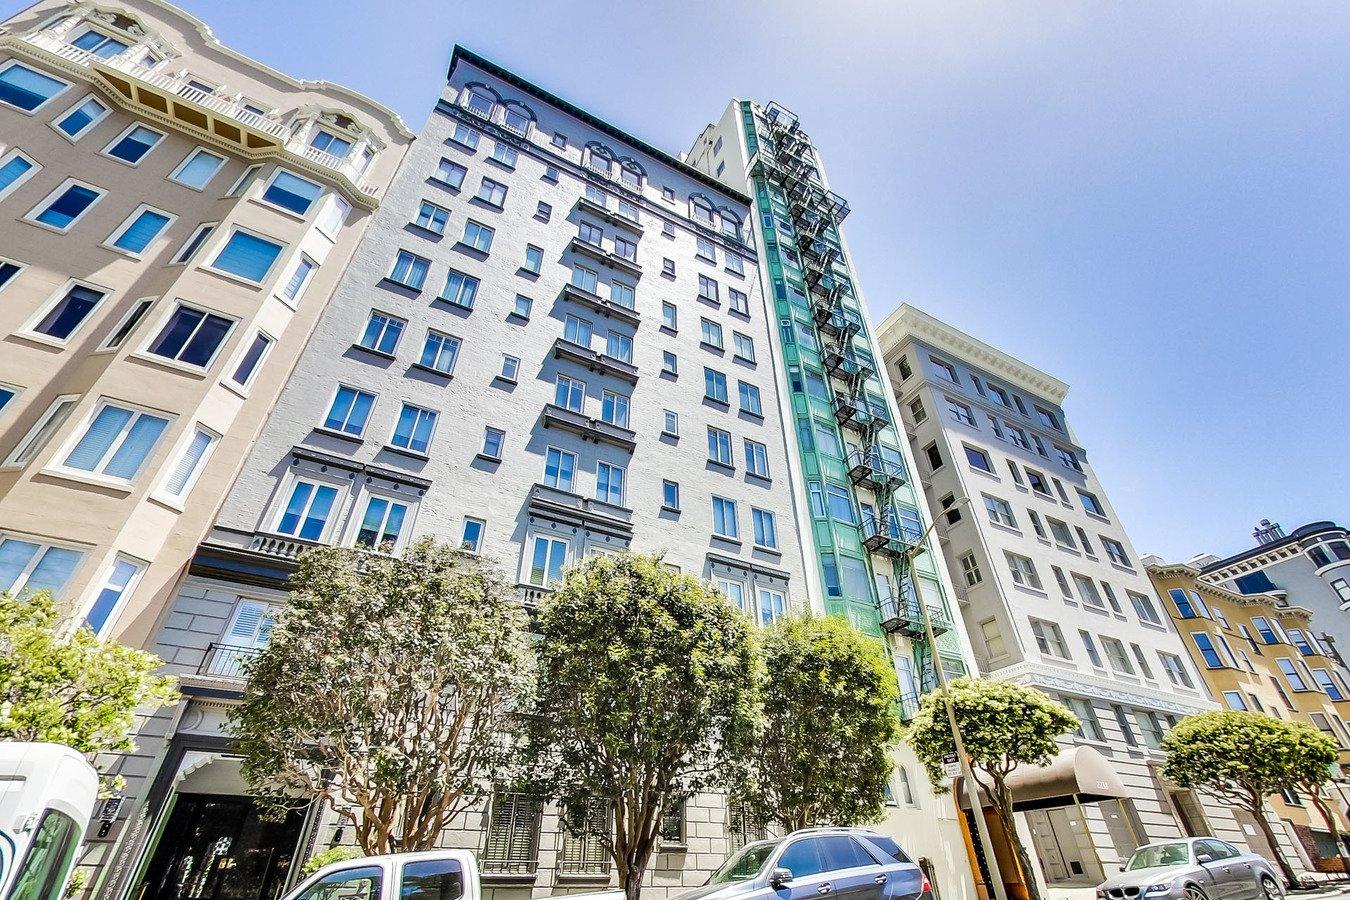 Studio 1 Bathroom Apartment for rent at 2238 Hyde Apartments & Suites in San Francisco, CA